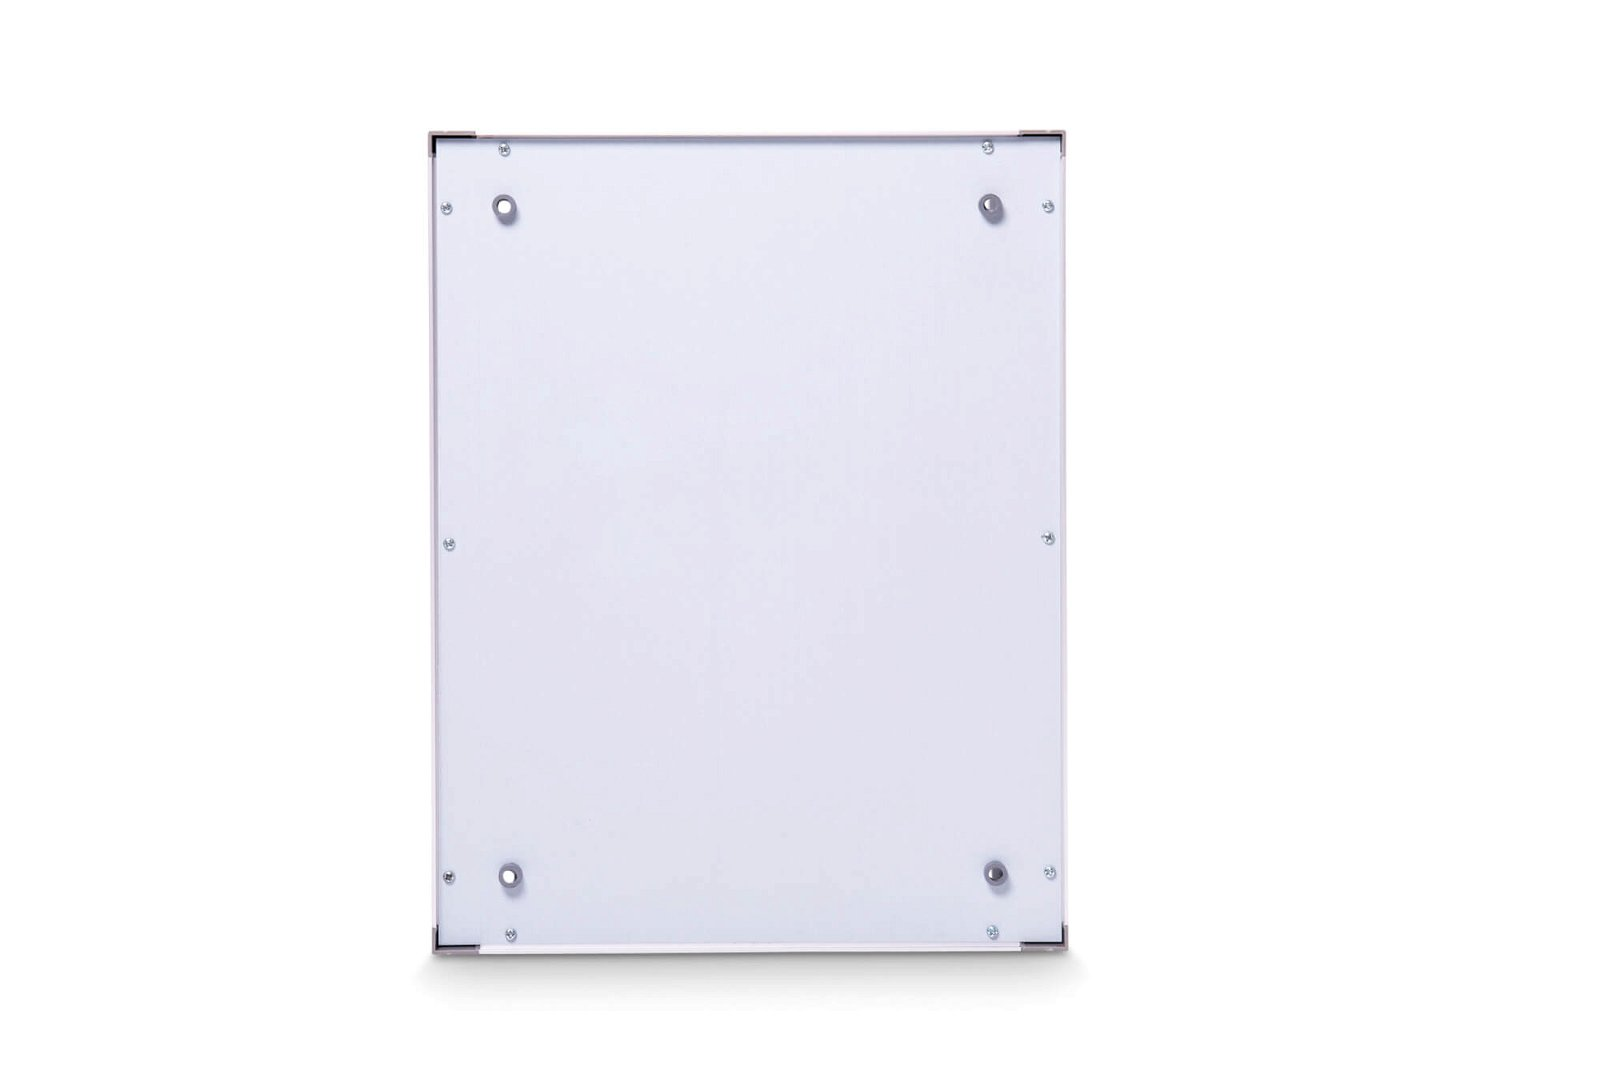 Schaukasten MAULextraslim, 1 x A4, aluminium